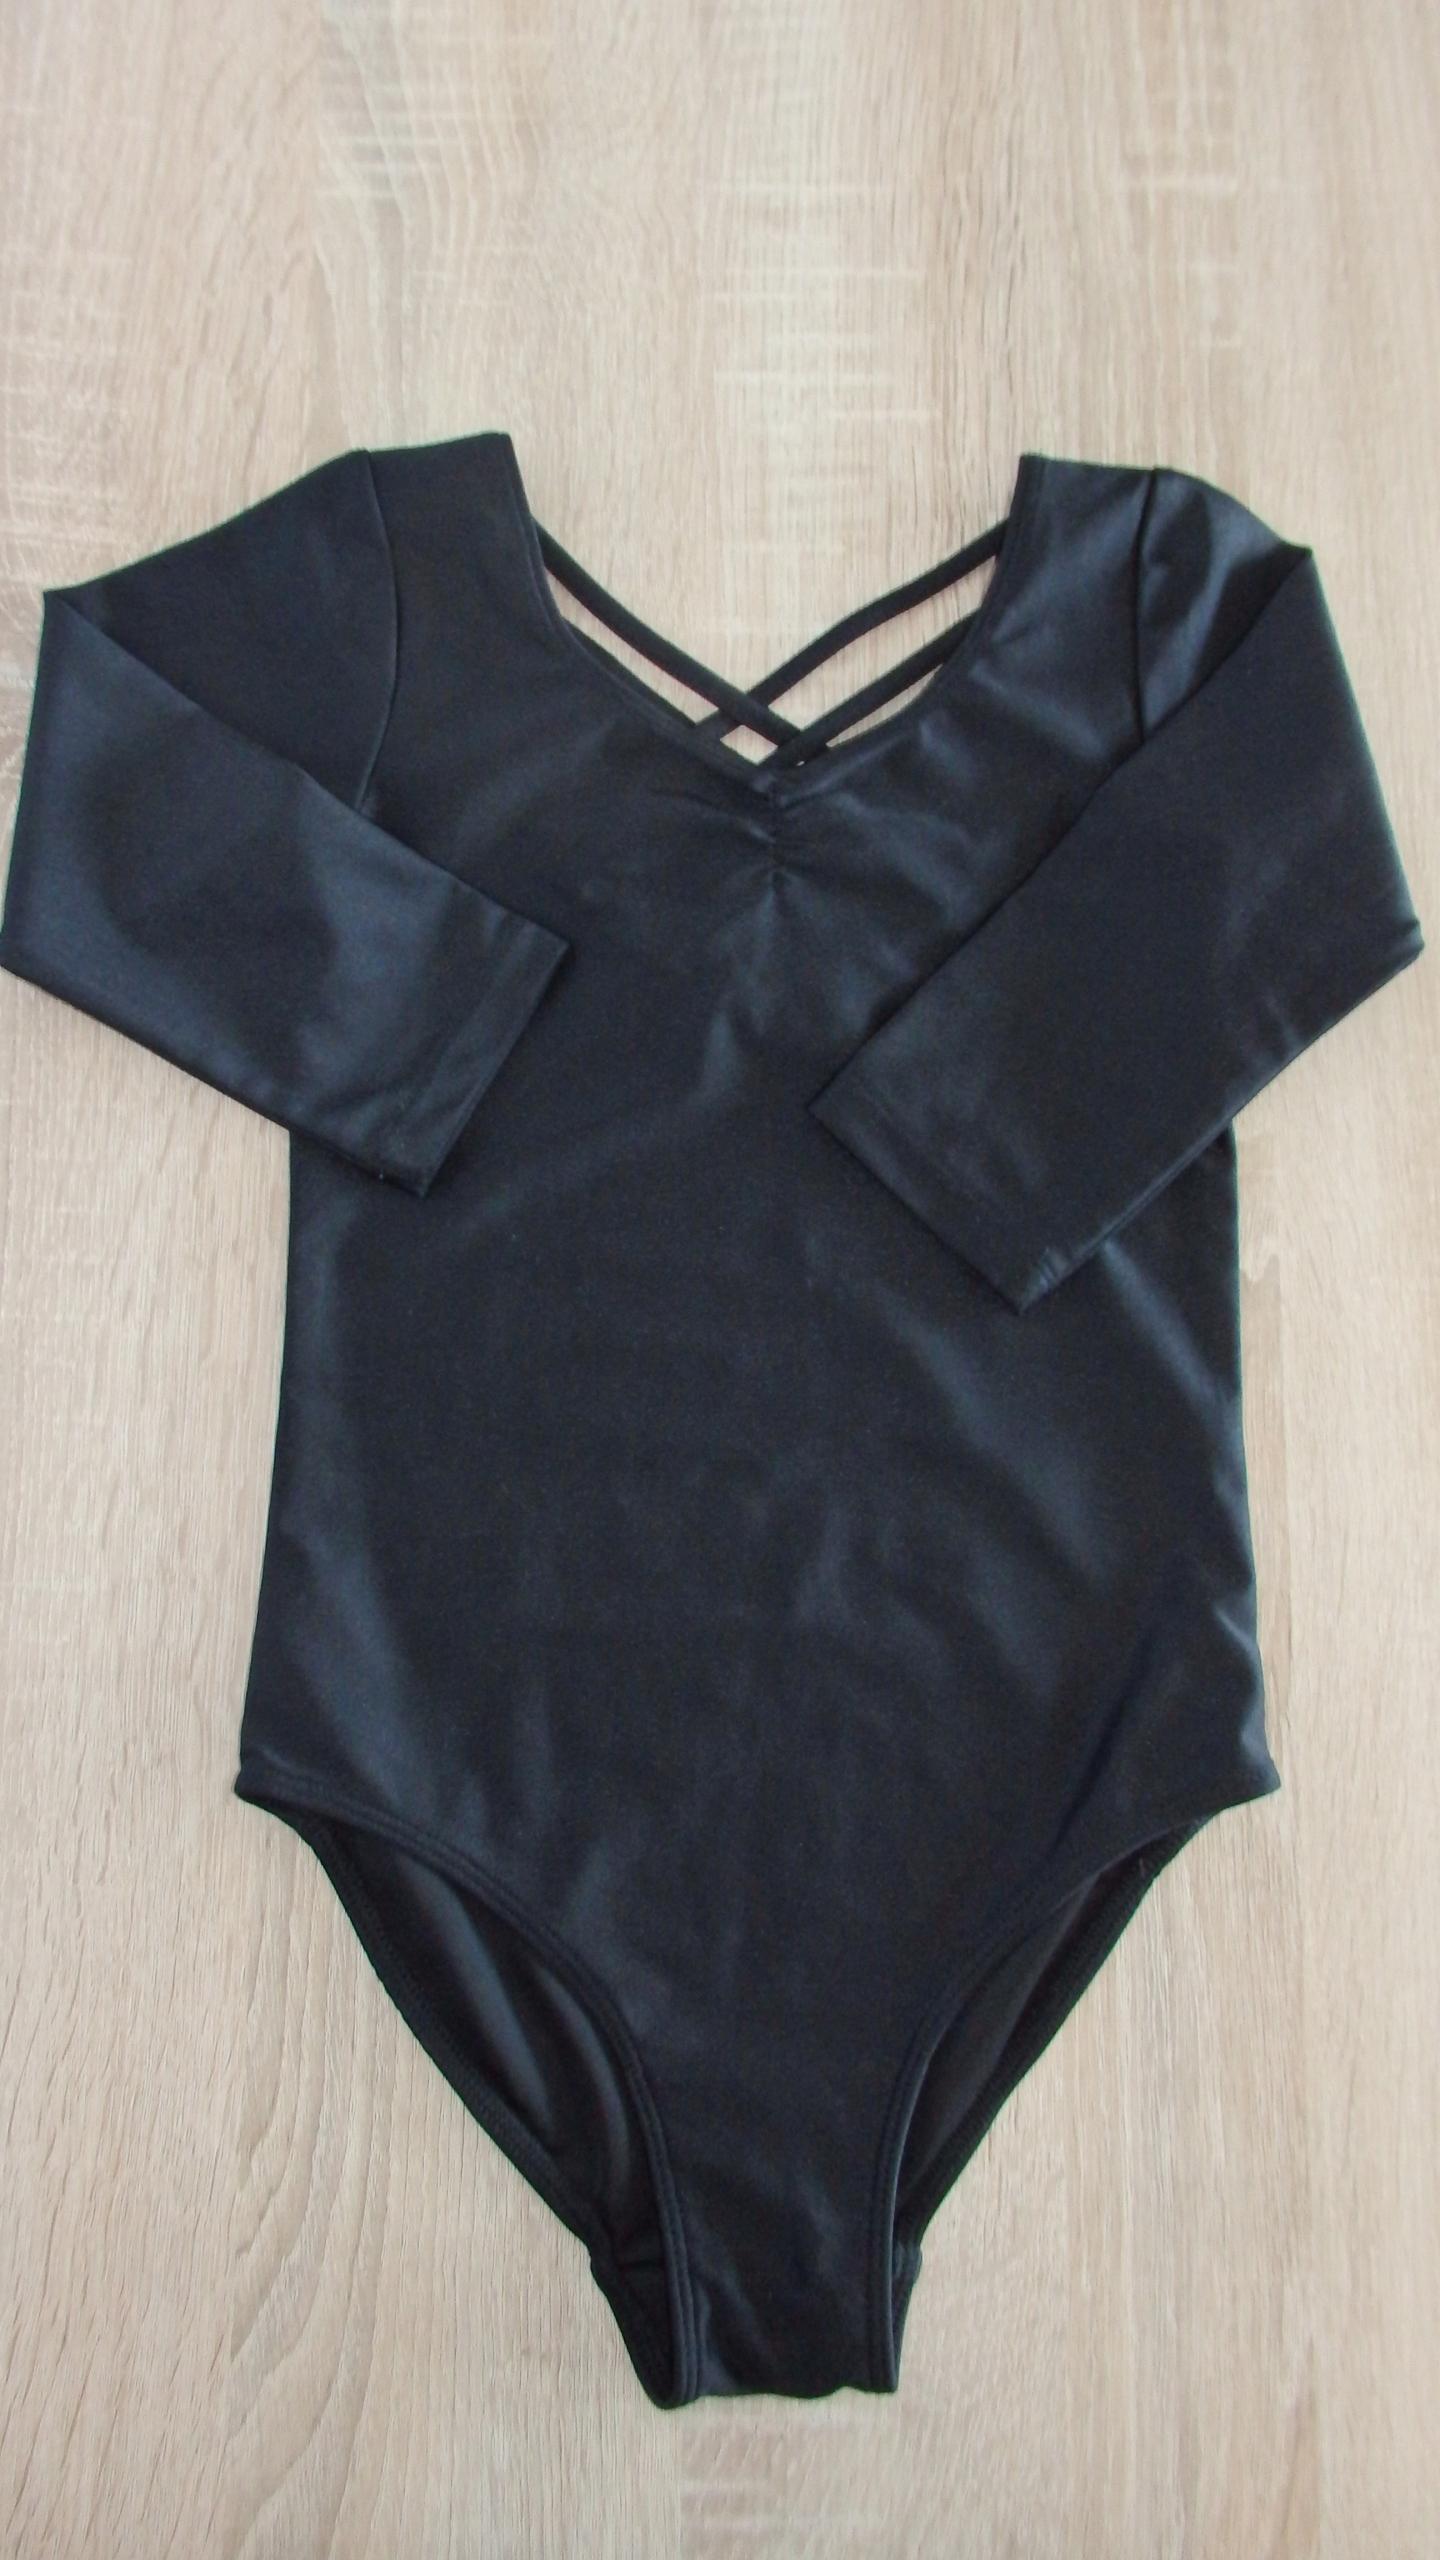 H&M body strój do tańca baletu r. 122/128